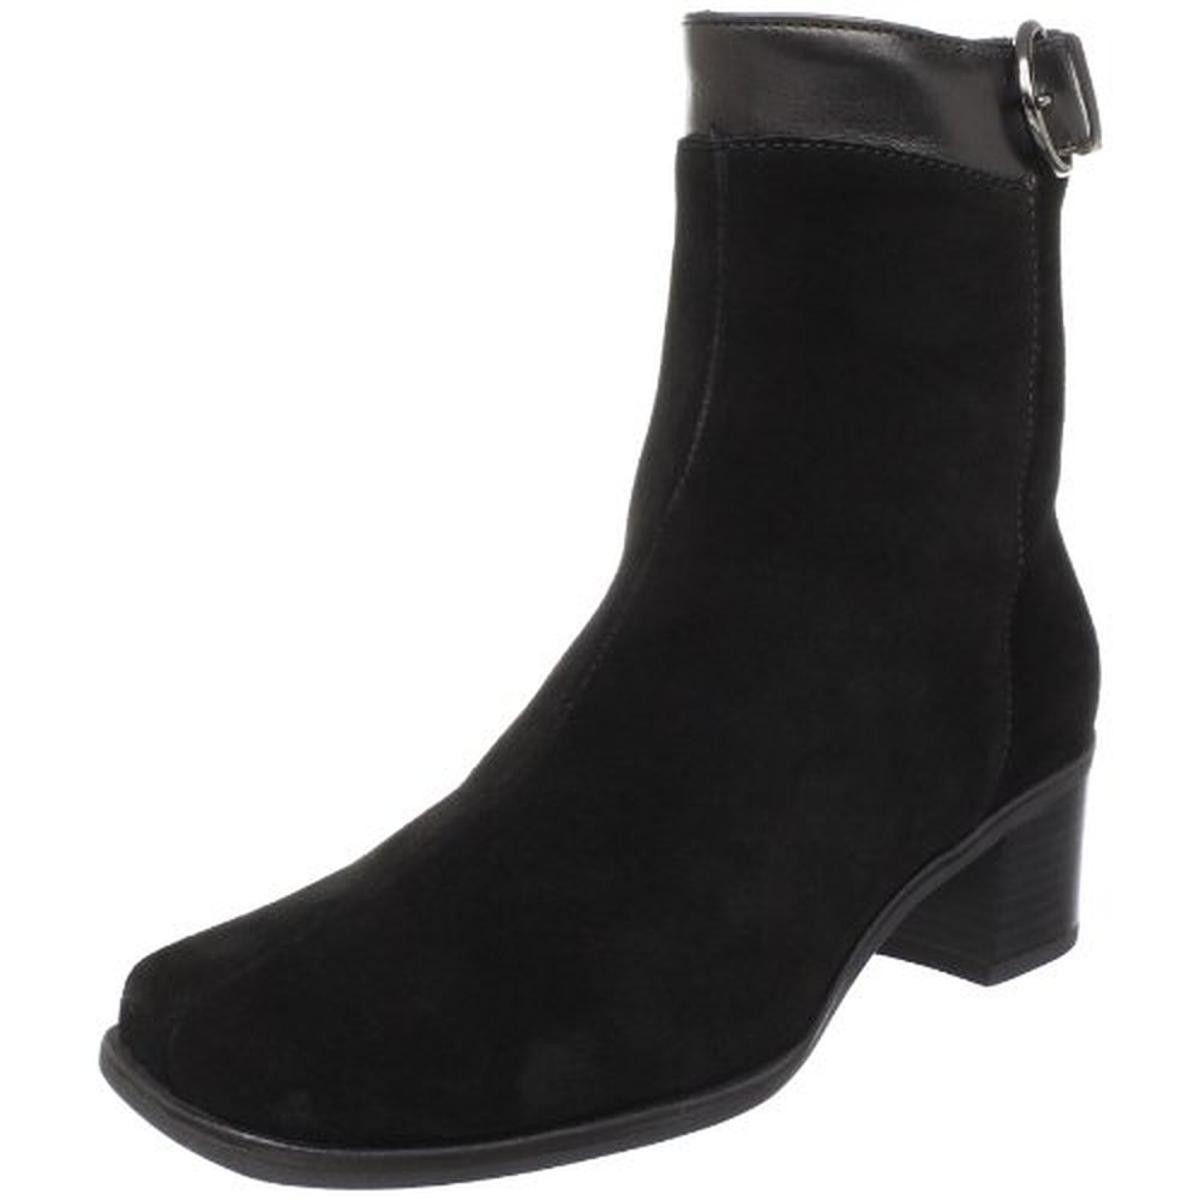 La Canadienne Womens Jaden Suede Waterproof Ankle Boots